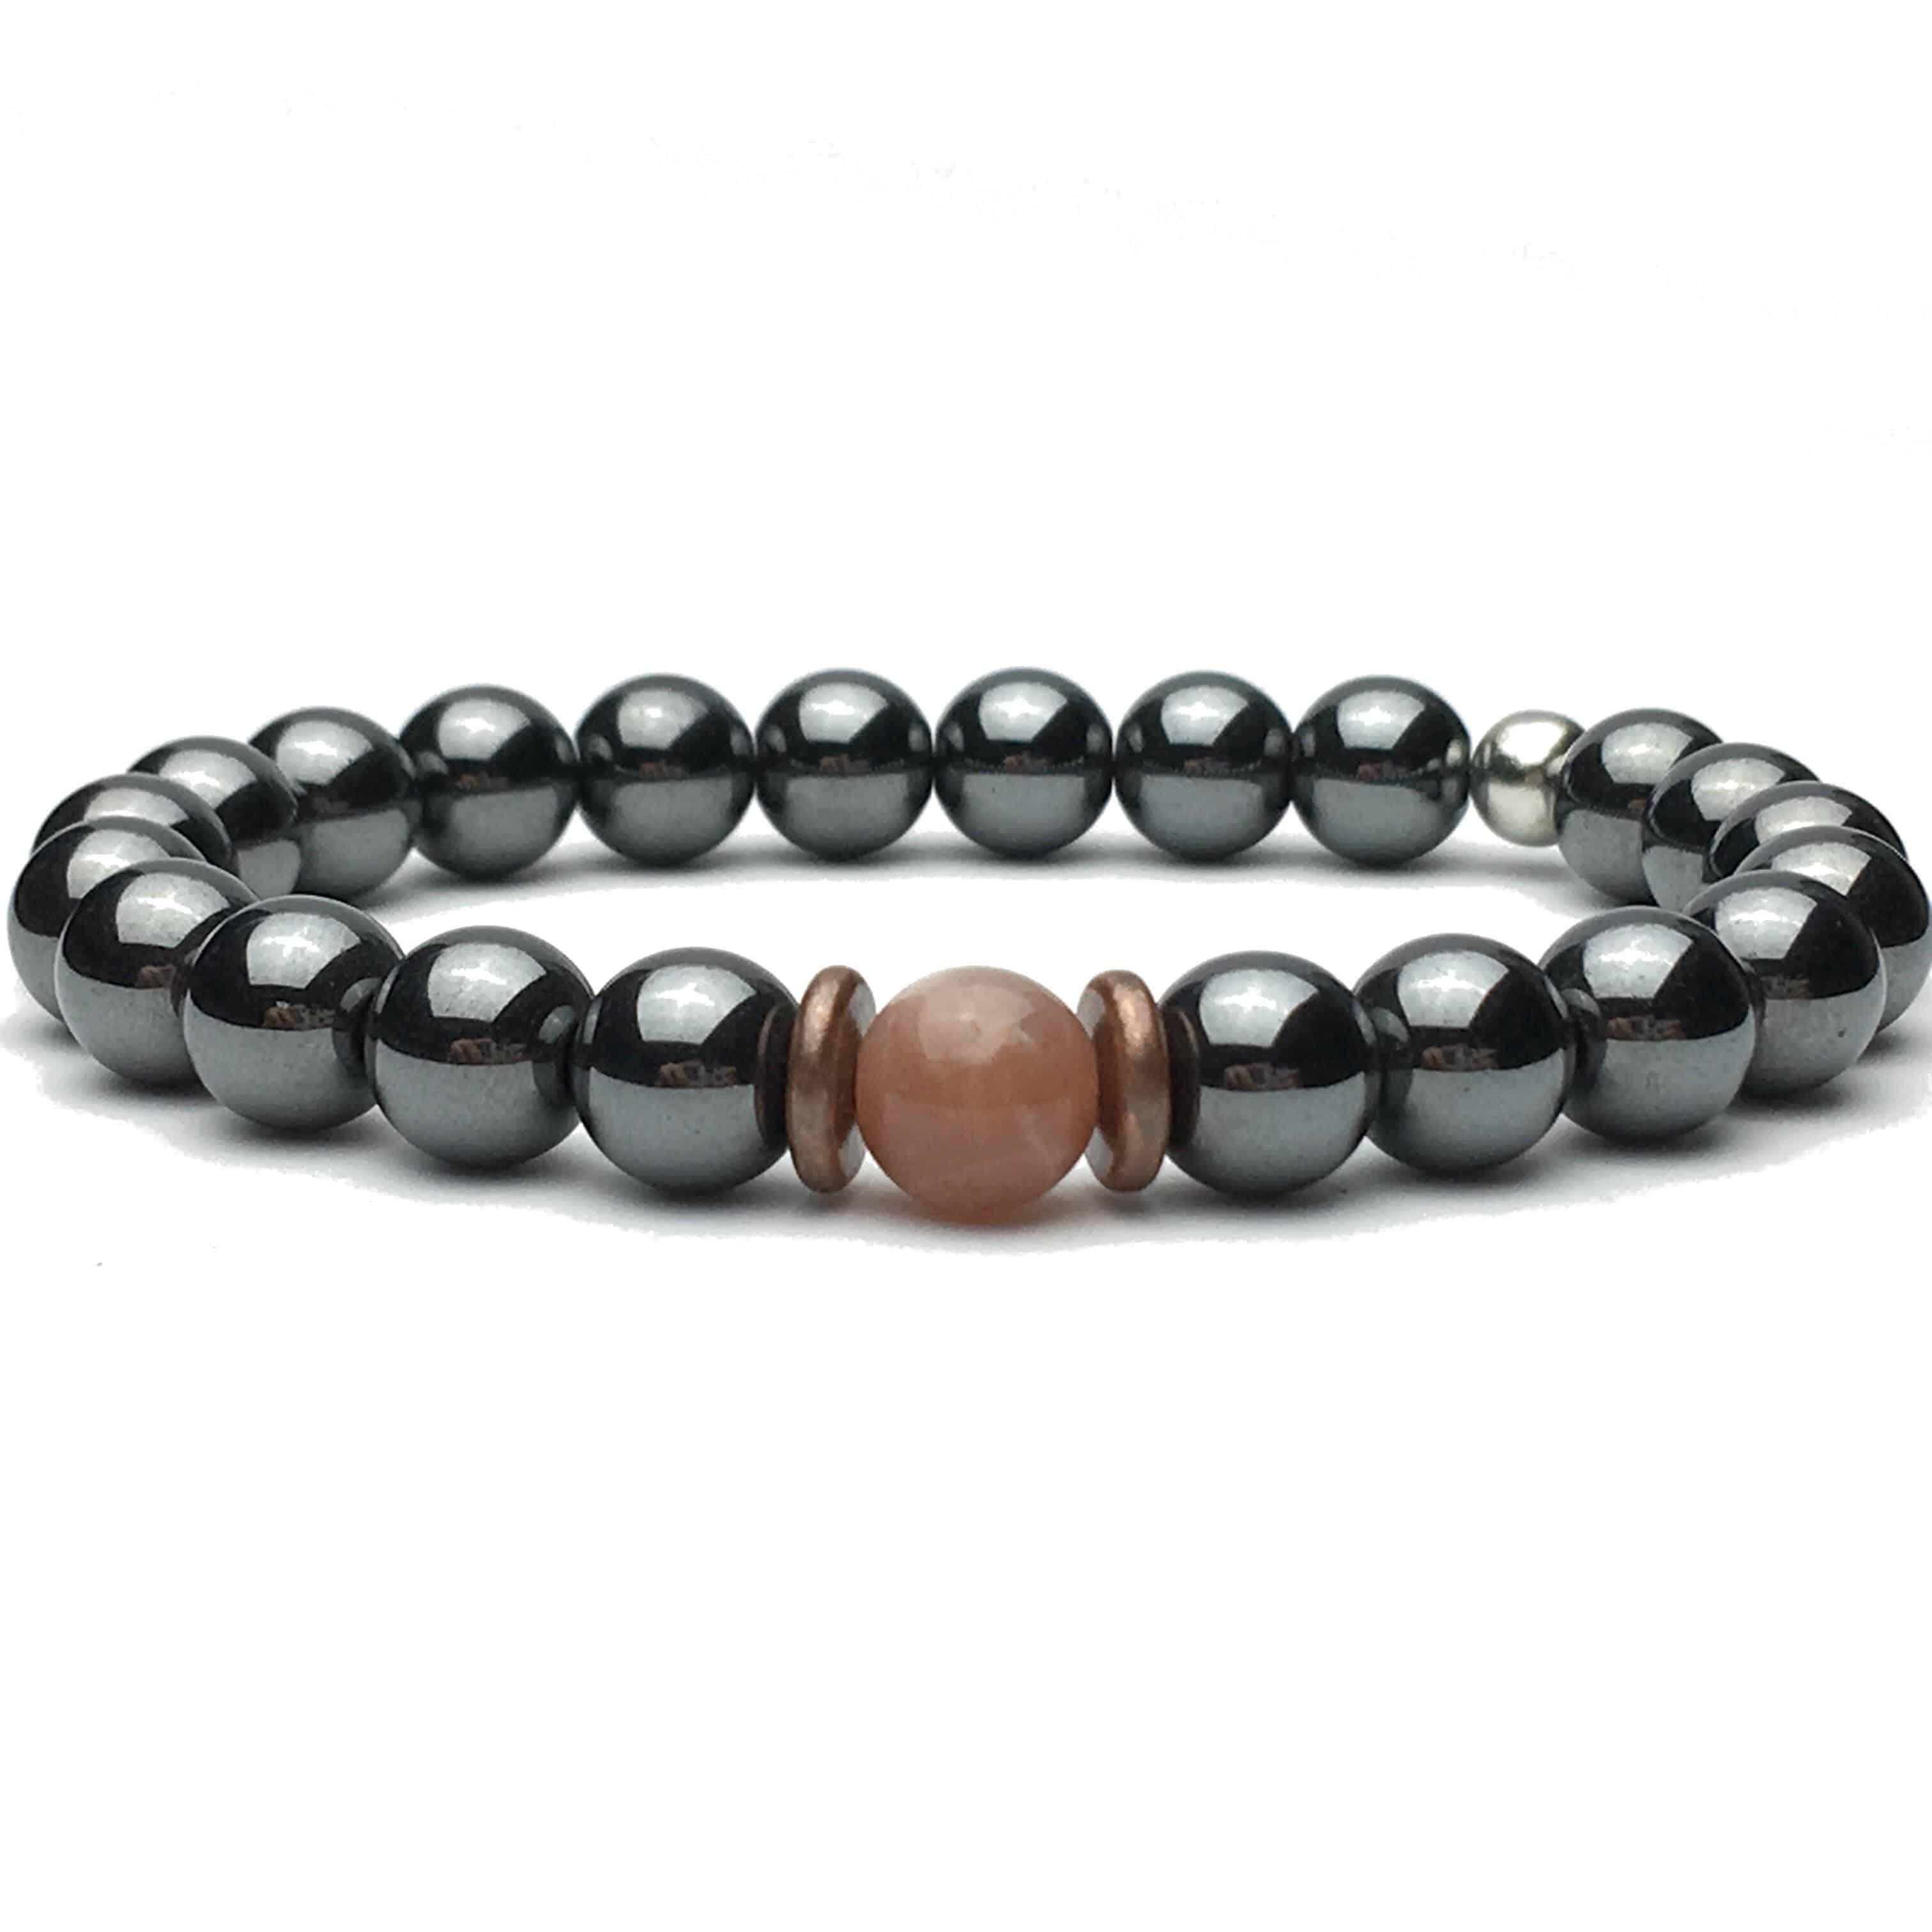 Hematite and Sunstone Bead Bracelet